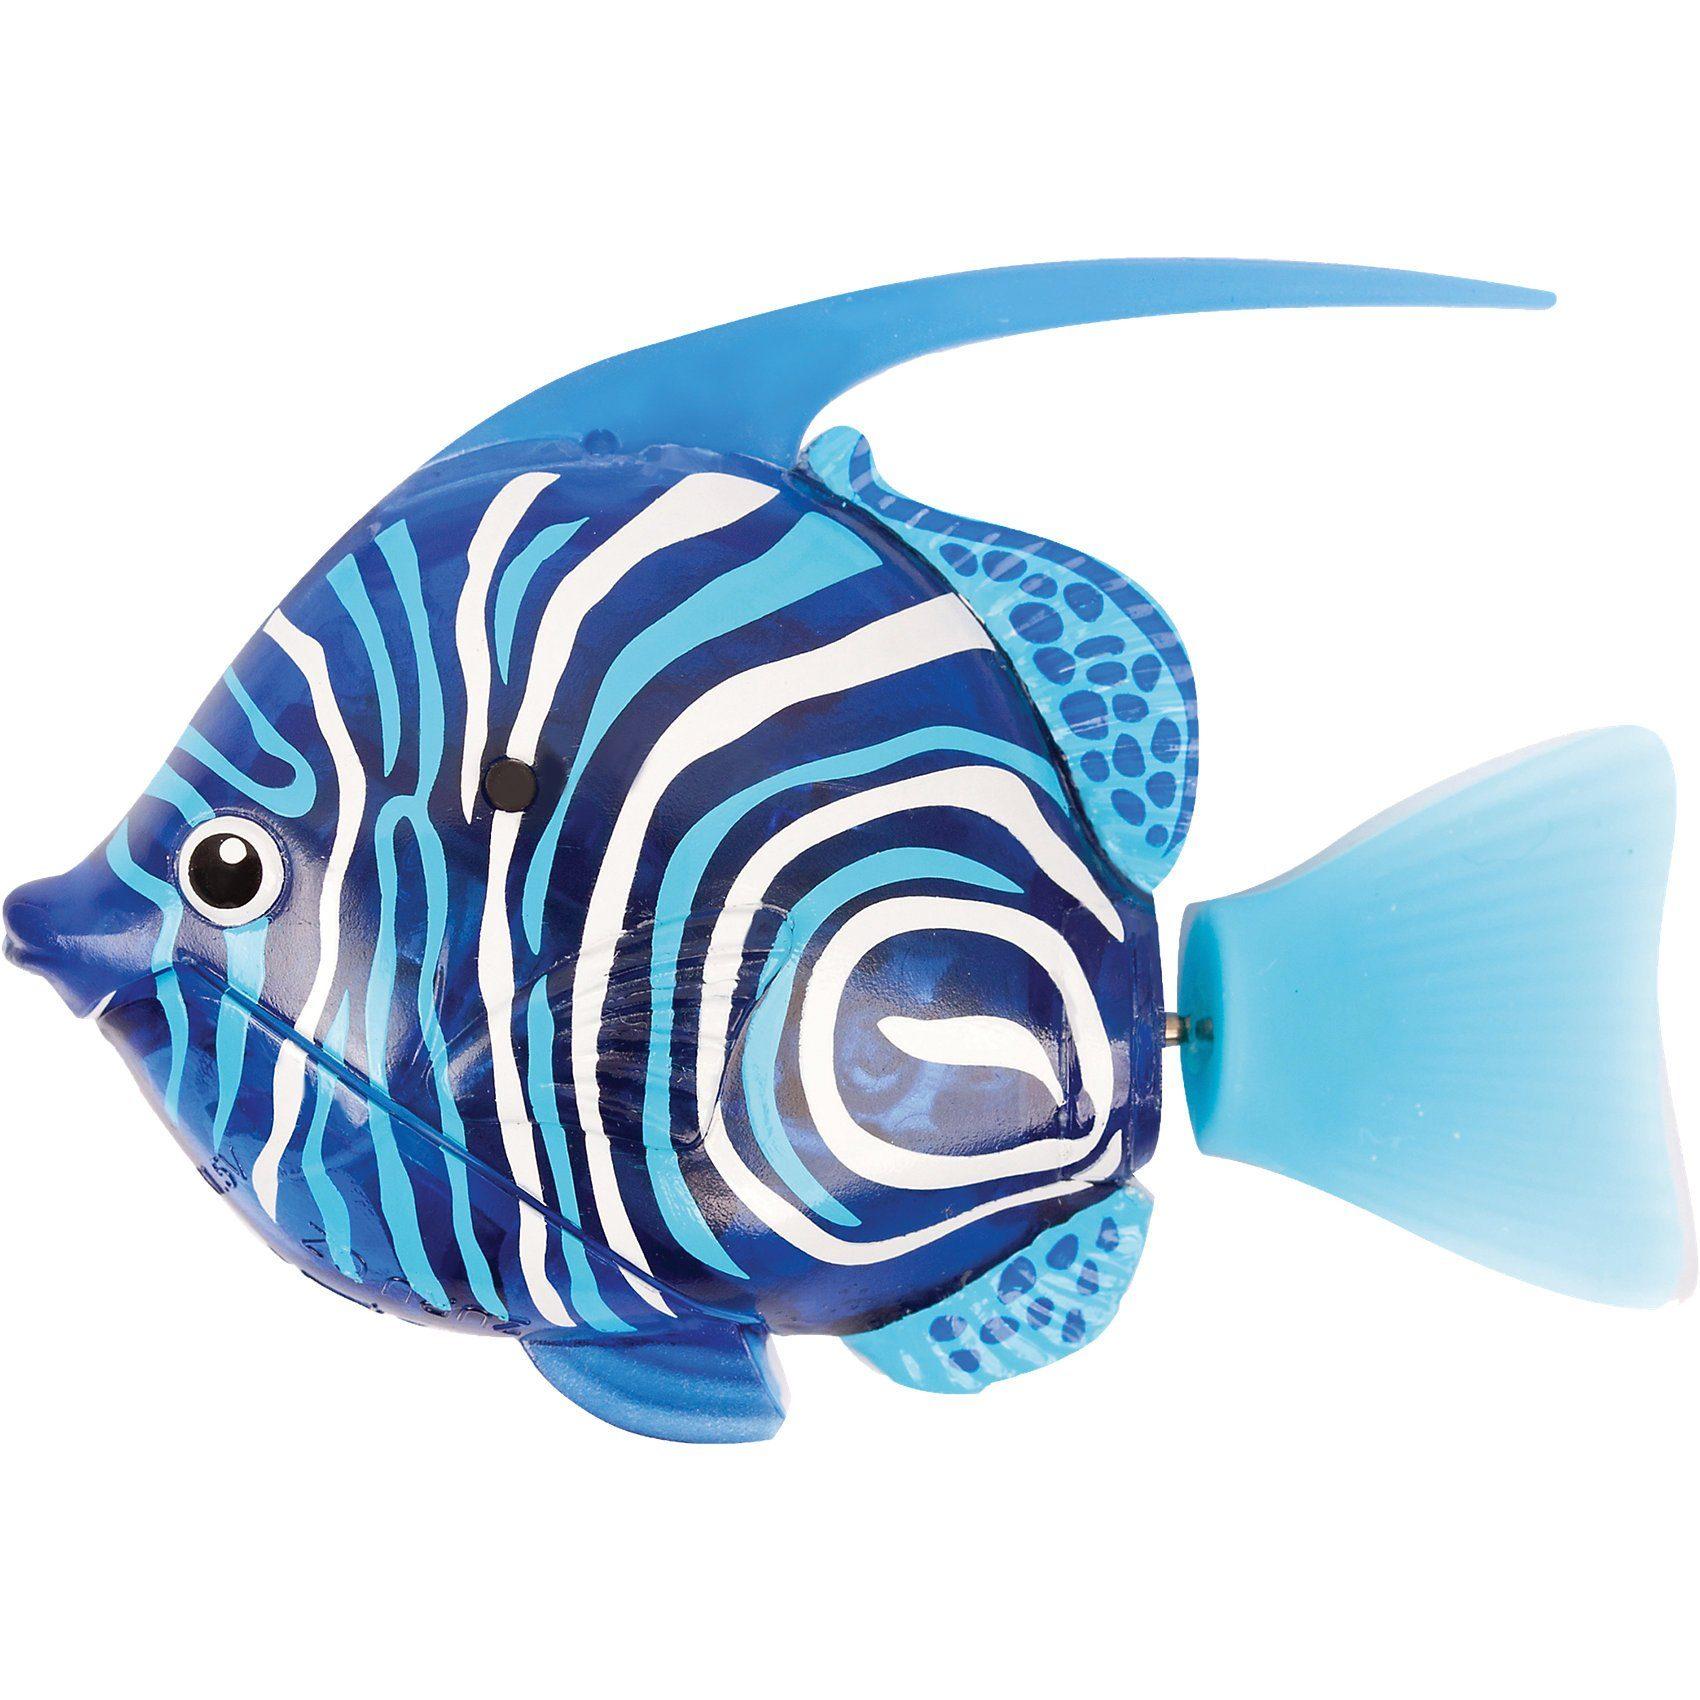 Goliath Robo Fish Tiefsee Wimplefish Blau